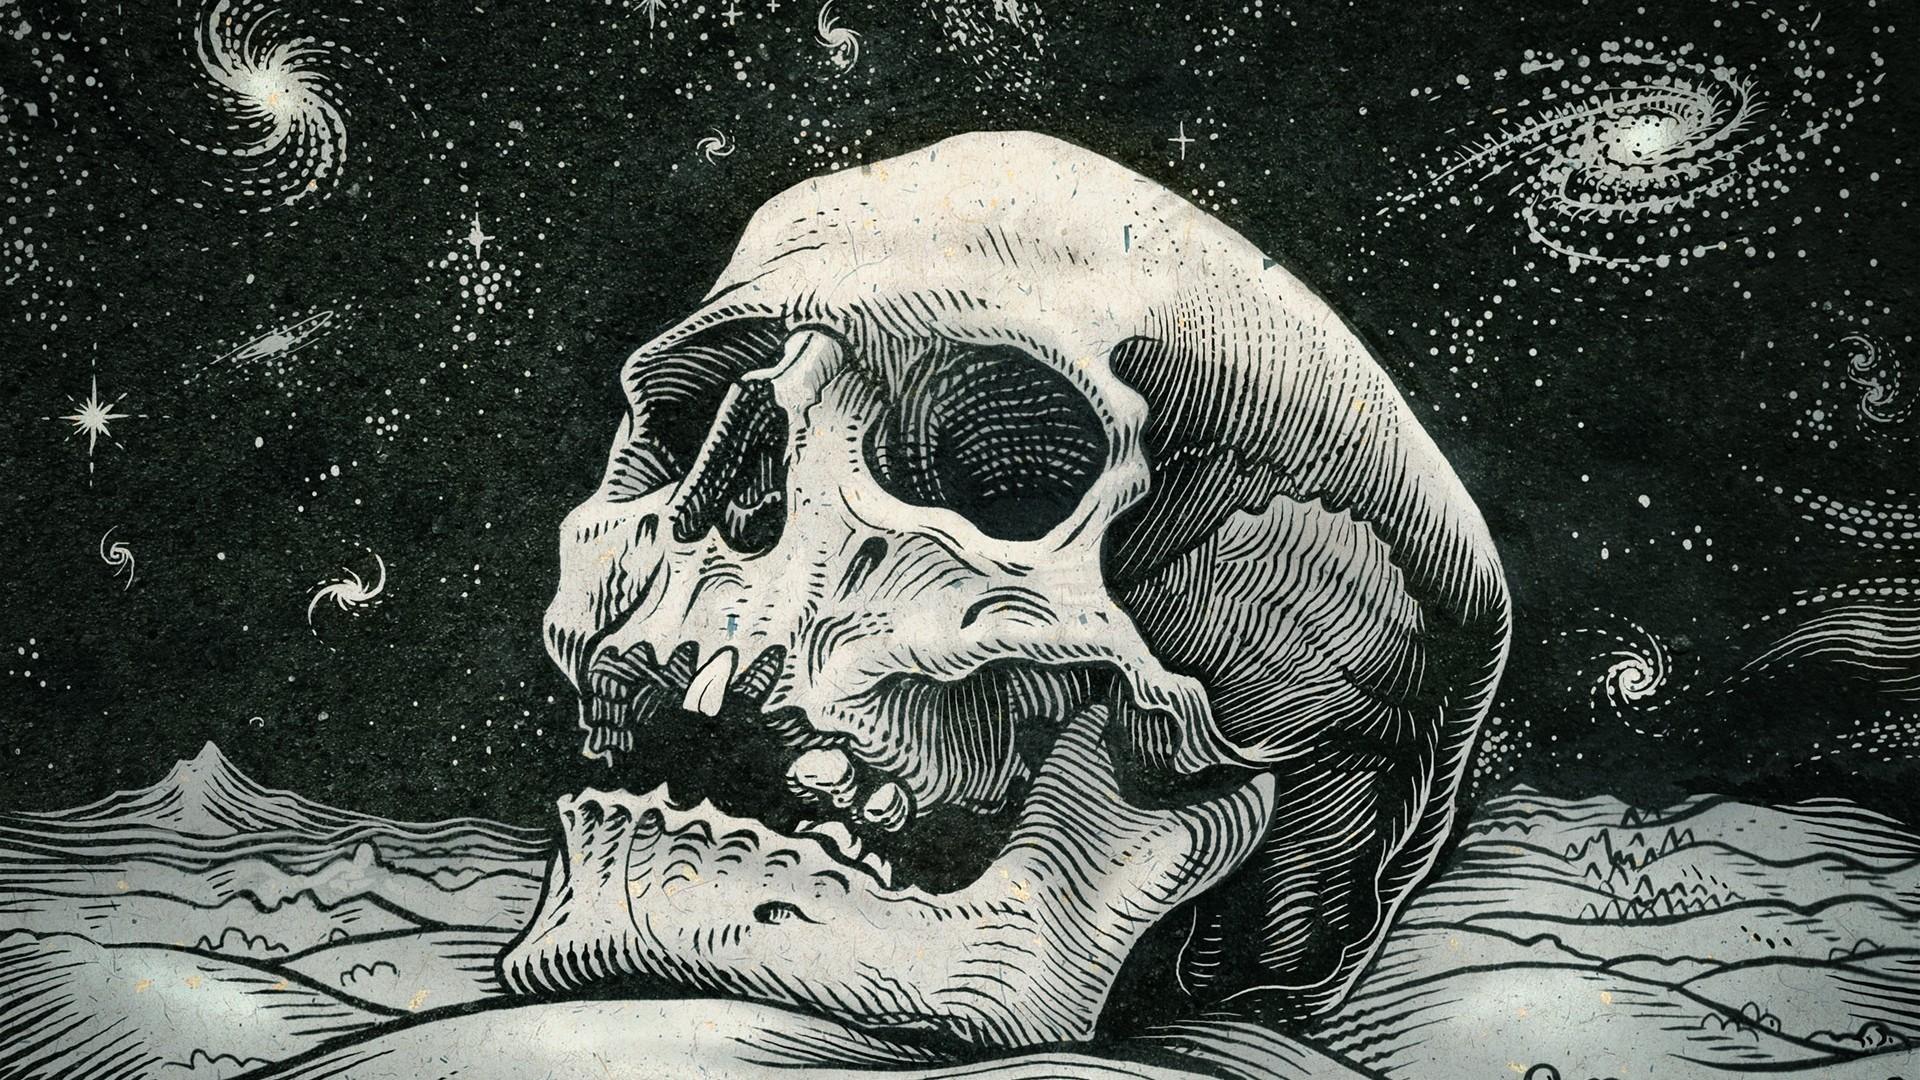 Free Skull Wallpaper for Laptop   HD Wallpapers   Pinterest   Skull  wallpaper, Hd skull wallpapers and Wallpaper